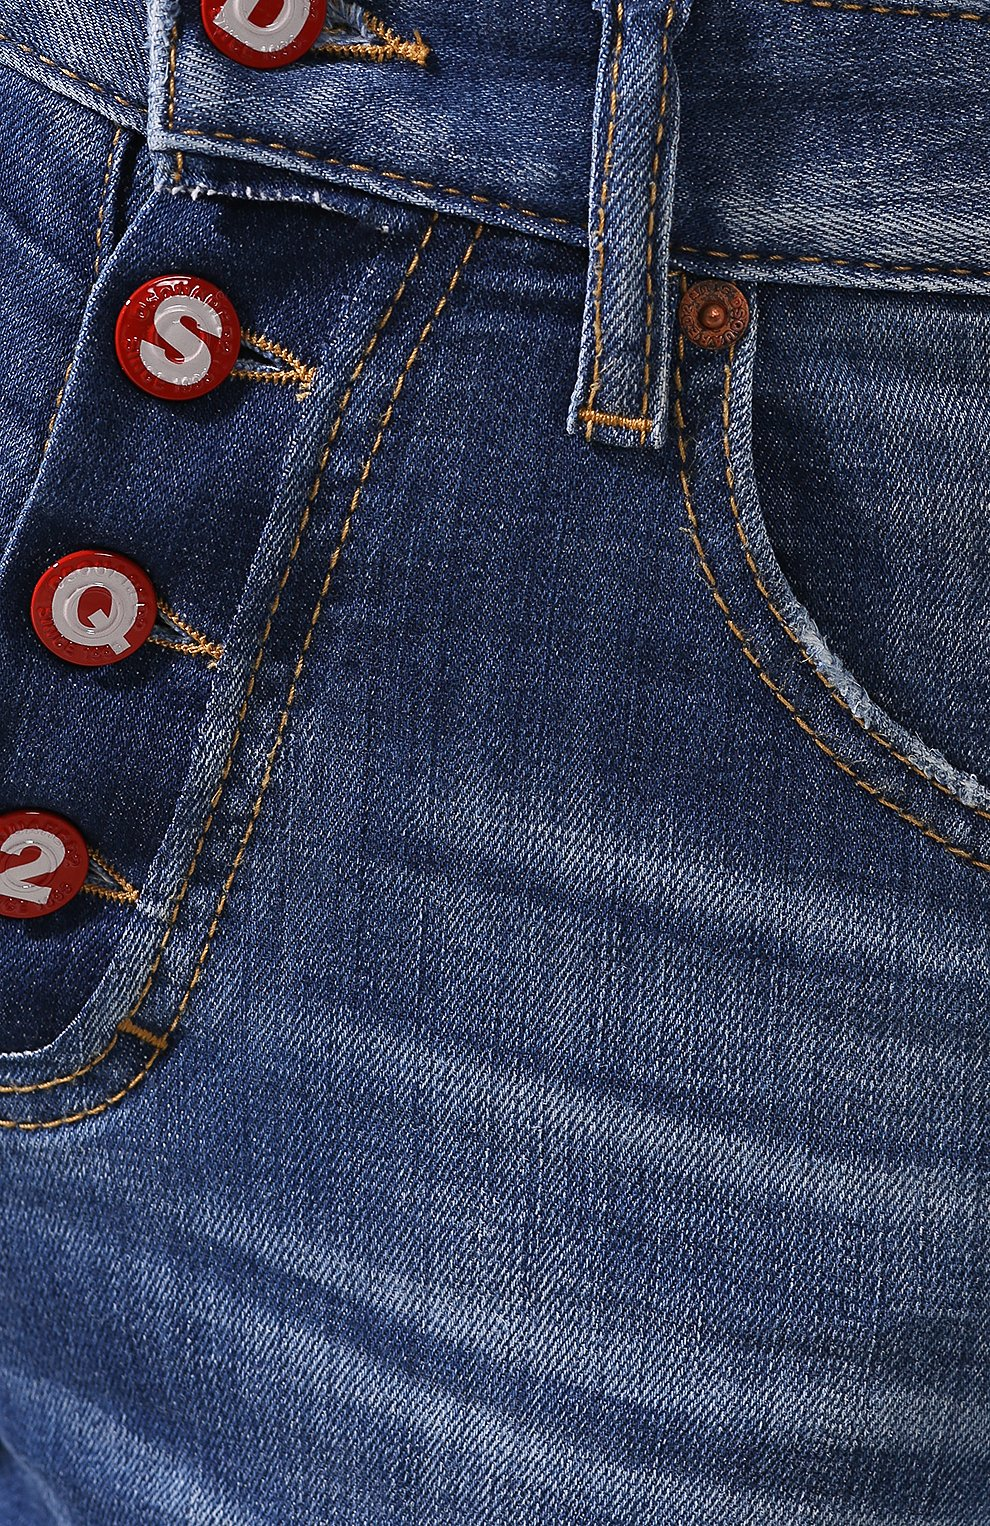 Женские джинсы DSQUARED2 синего цвета, арт. S72LB0287/S30342 | Фото 5